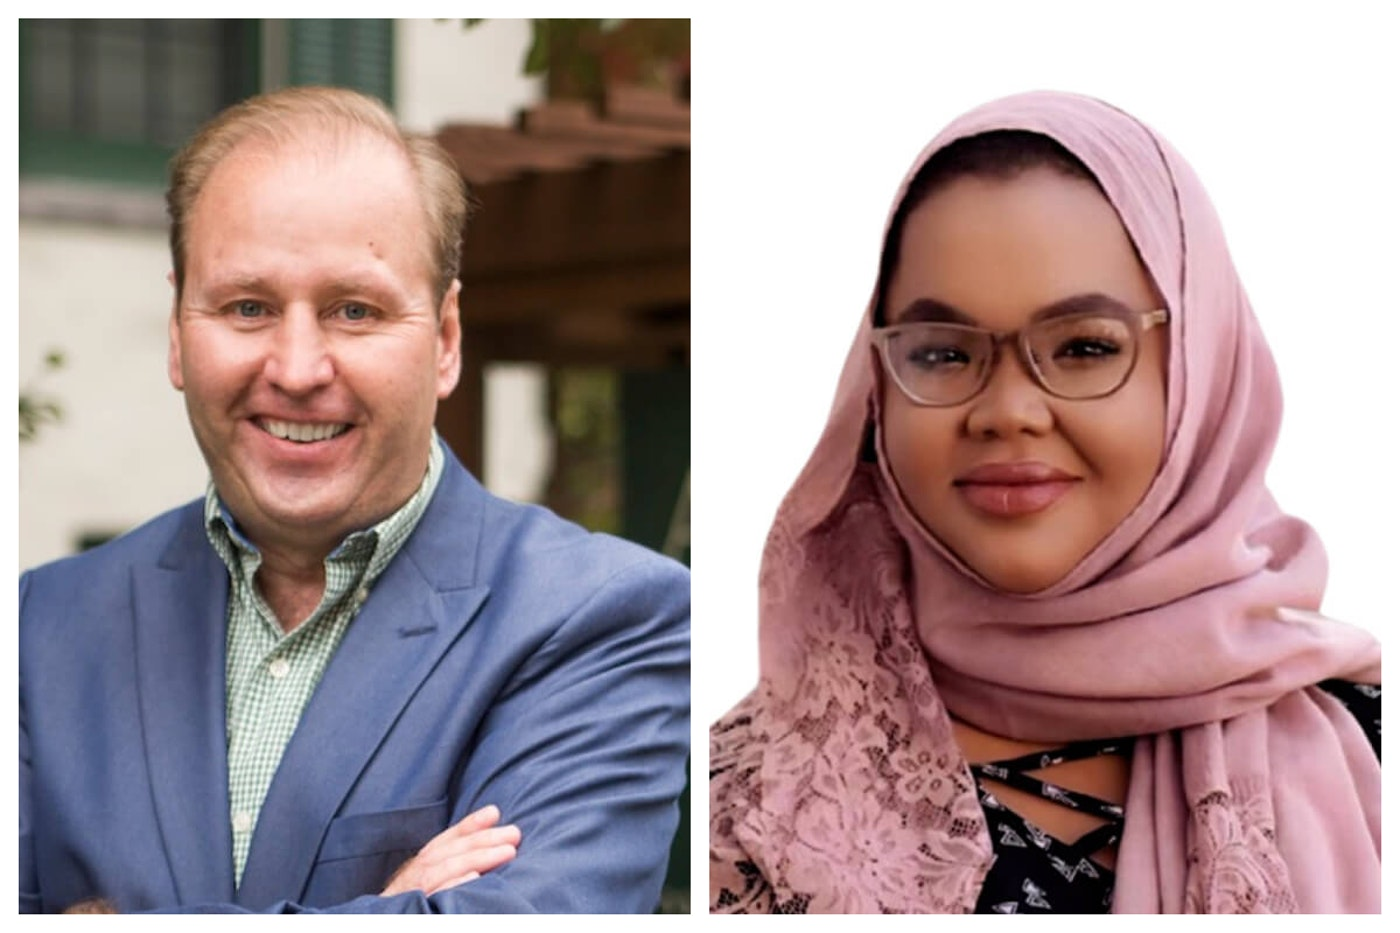 The UNN Candidate Interview: Nada Elmikashfi and John Imes of Senate District 26